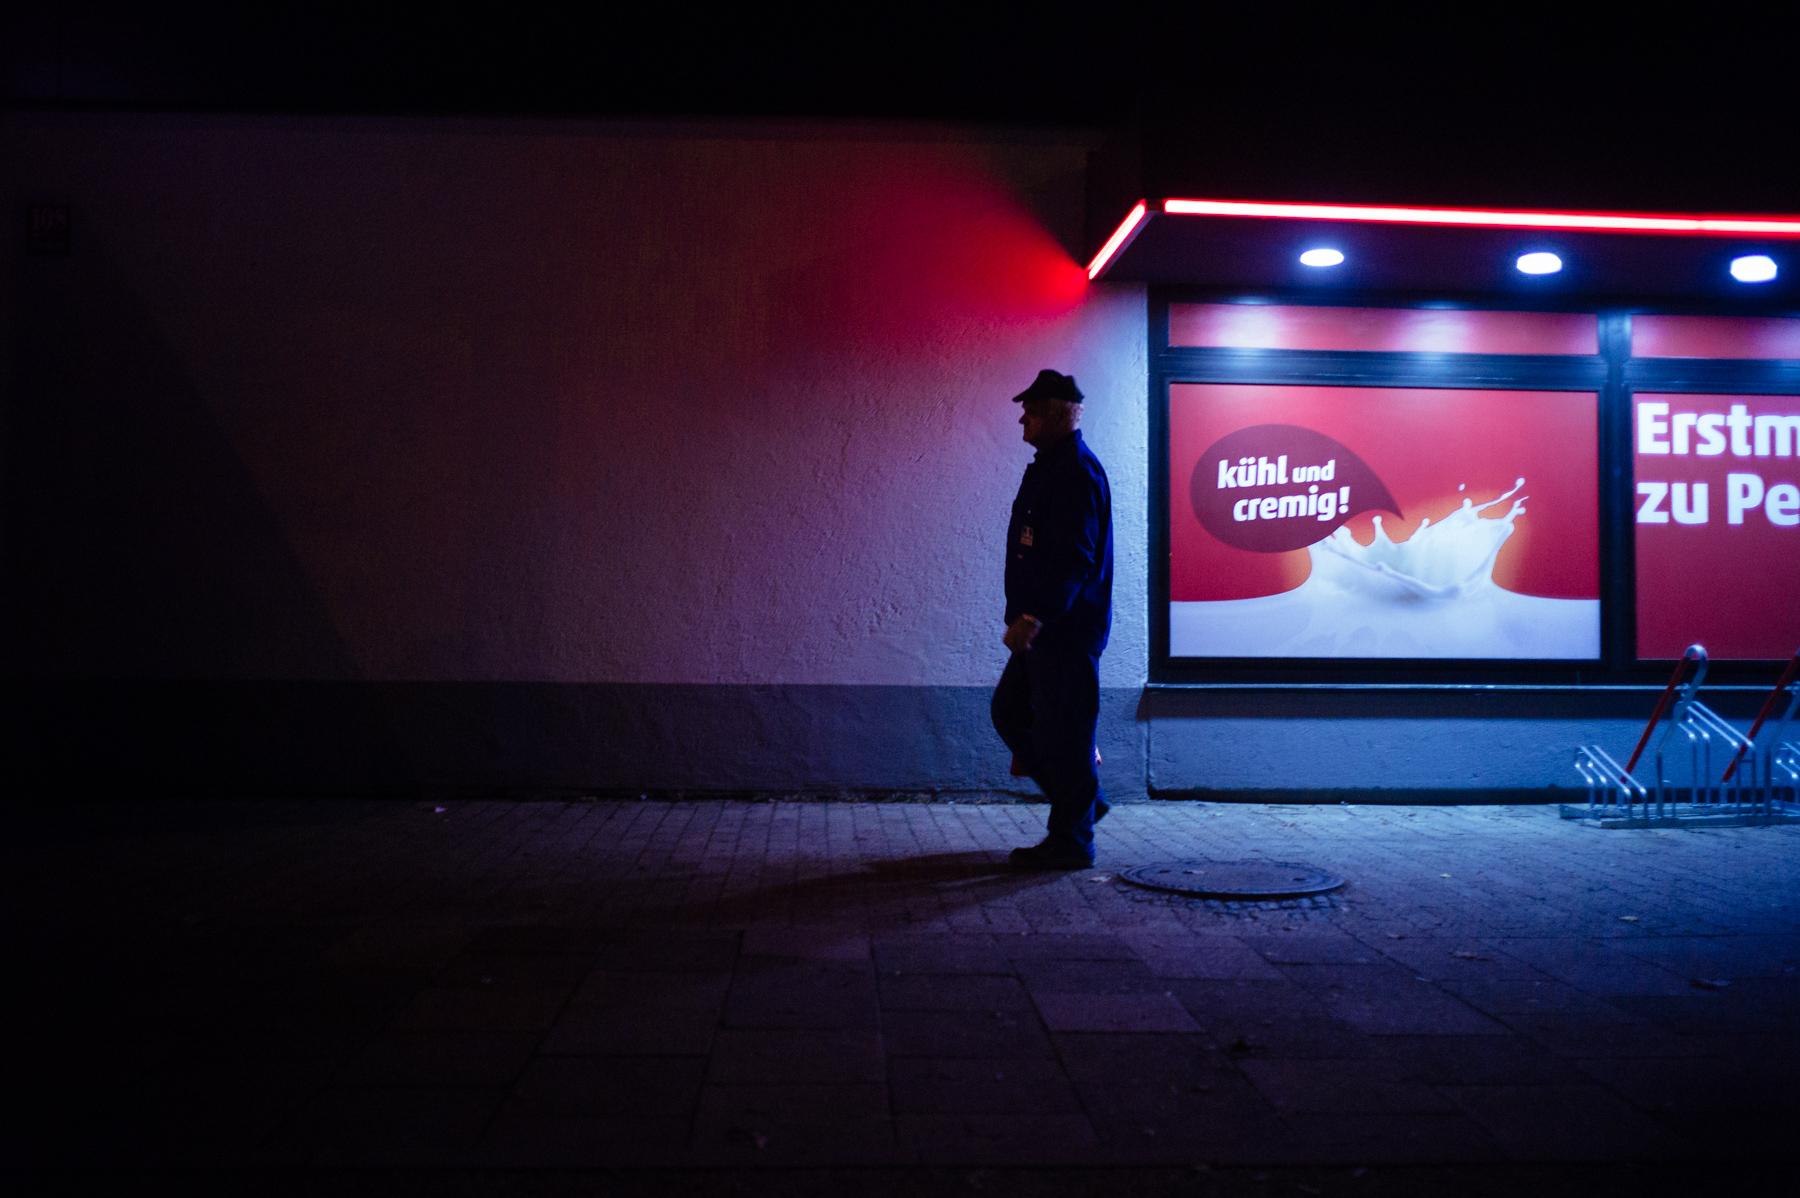 andre-duhme-fotograf-mu%cc%88nchenl1010984